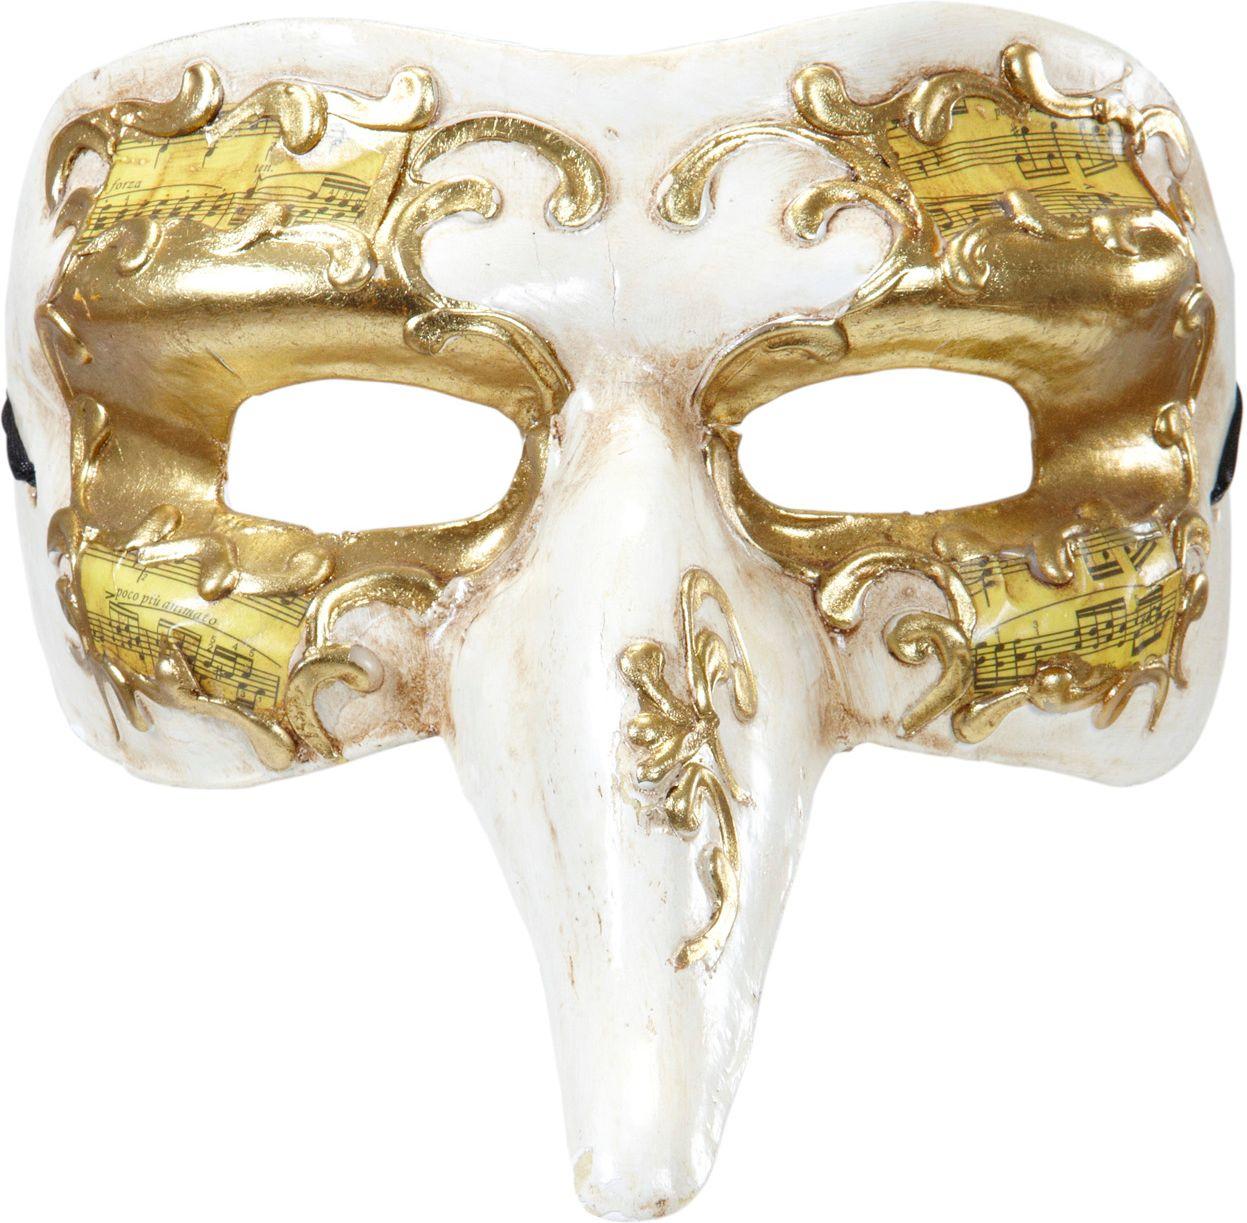 Wit gouden nasone masker